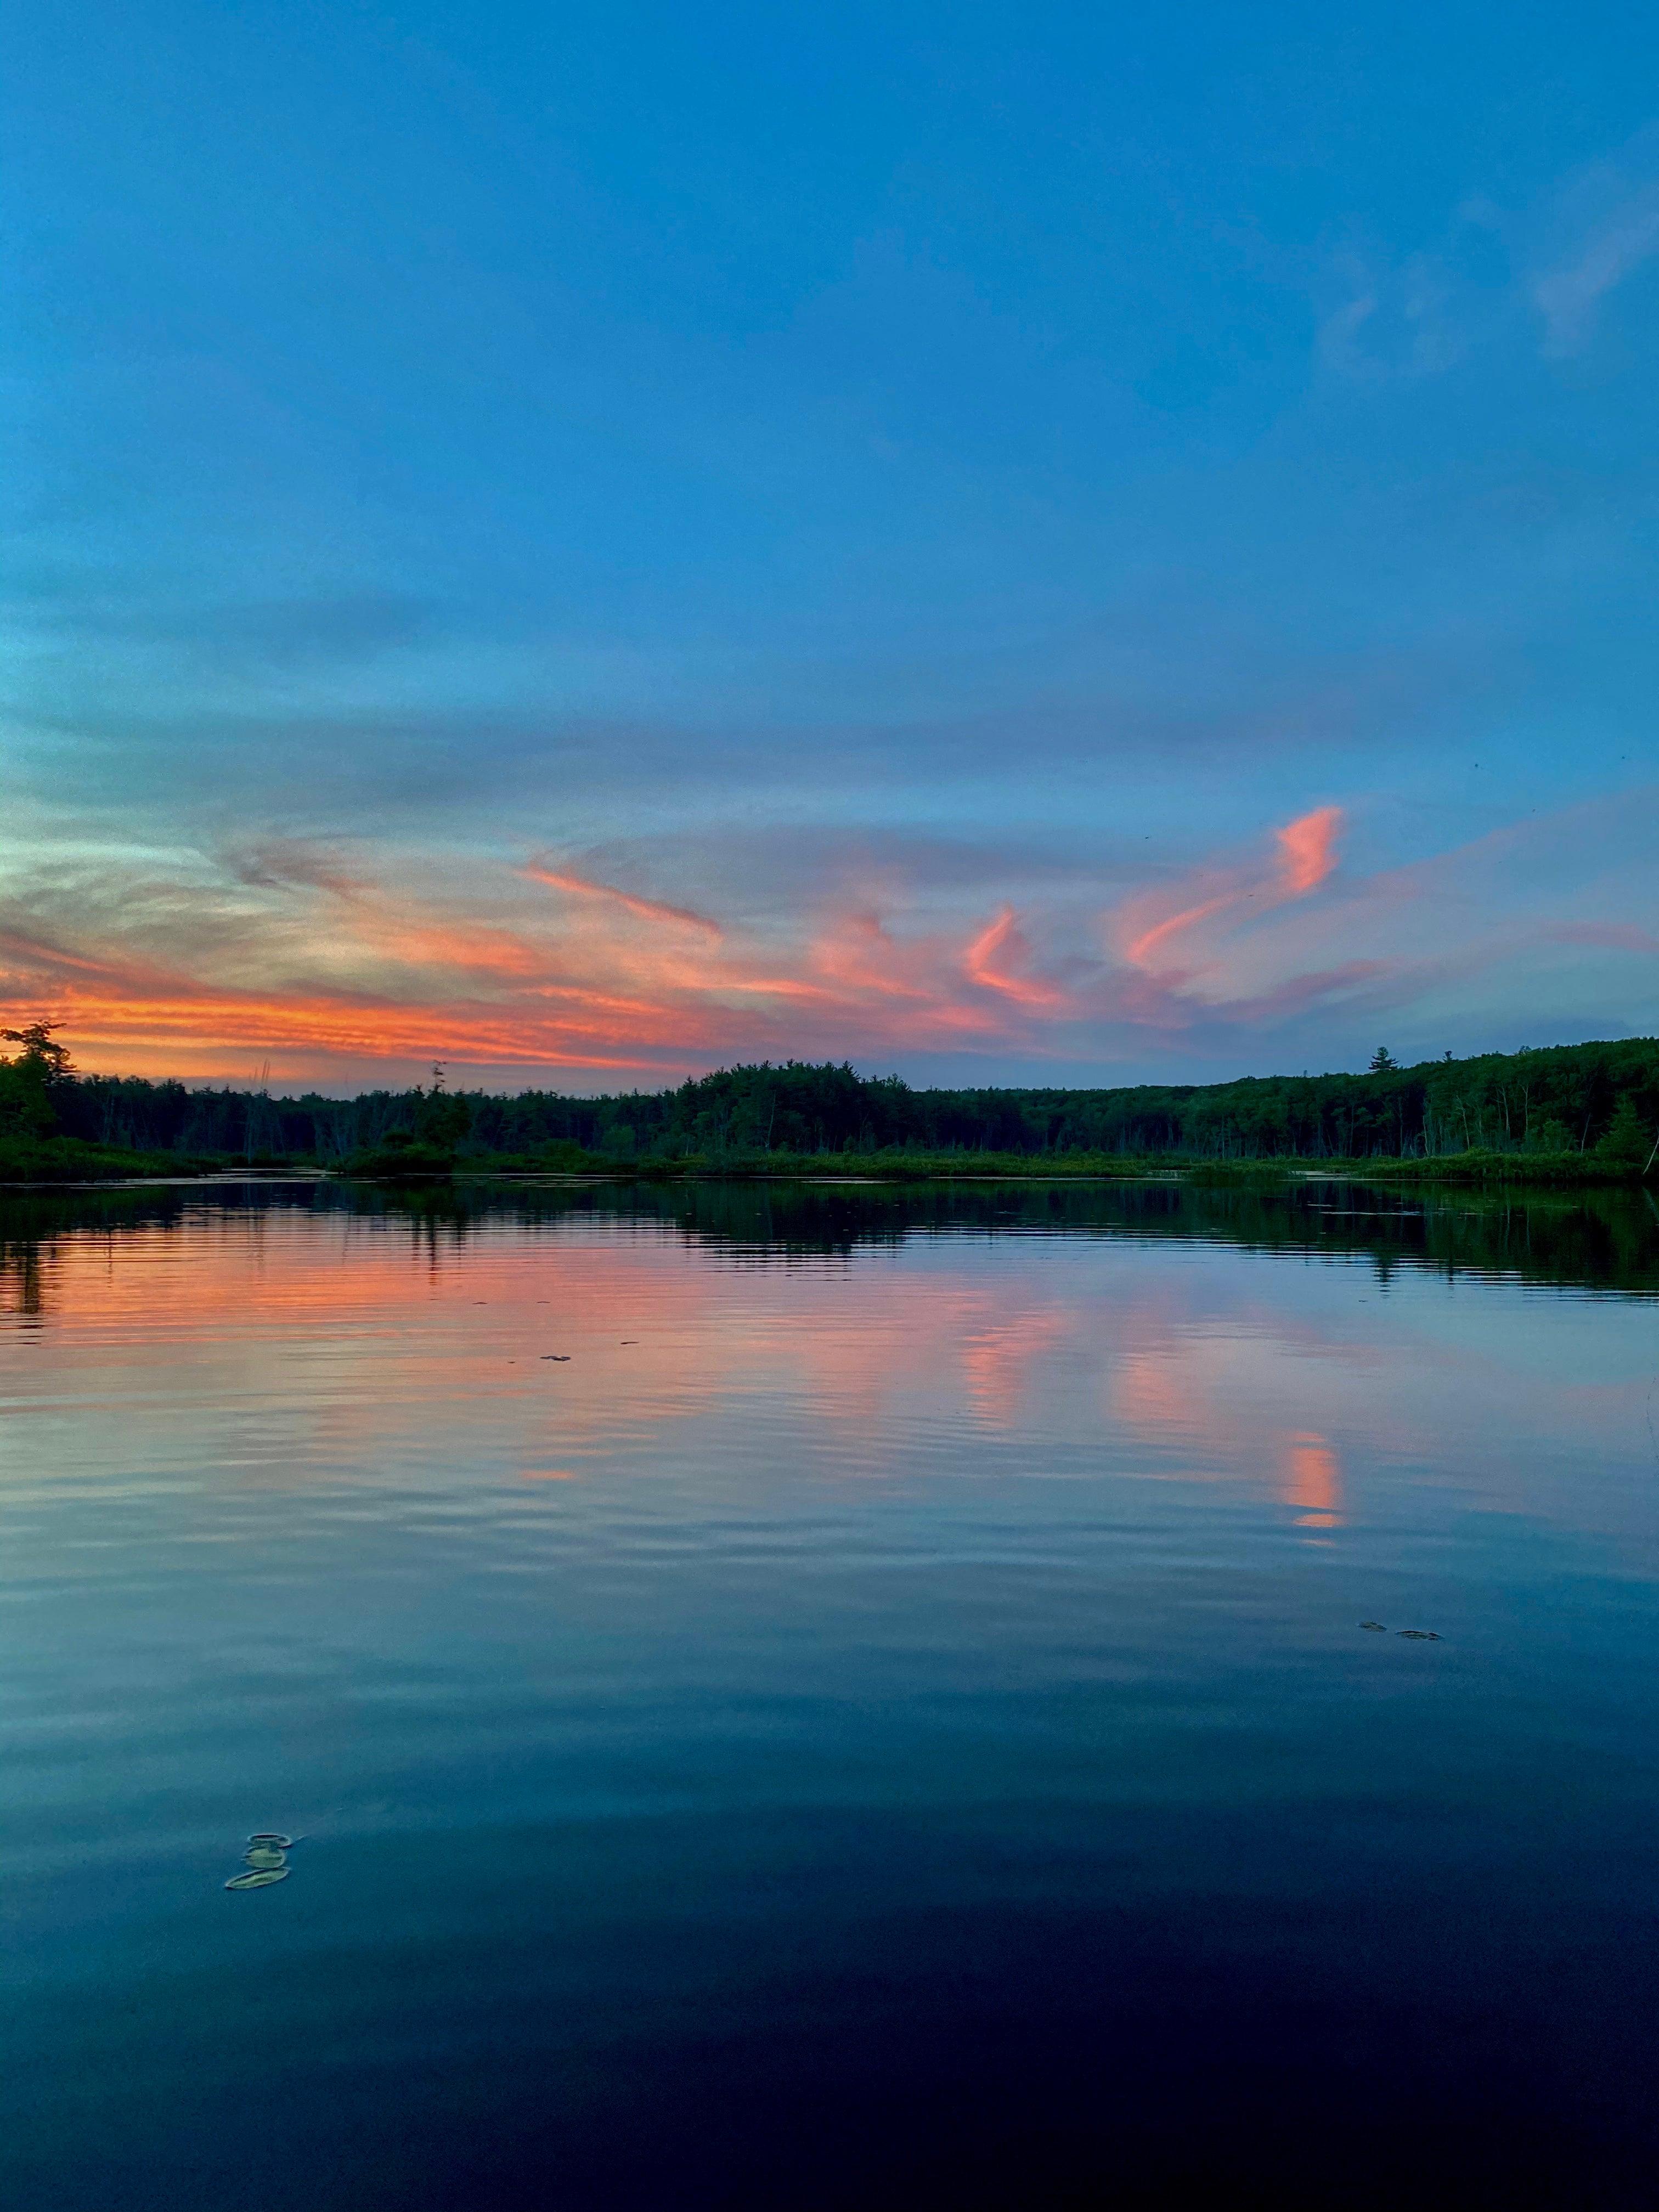 Moosehorn Pond in Hubbardston